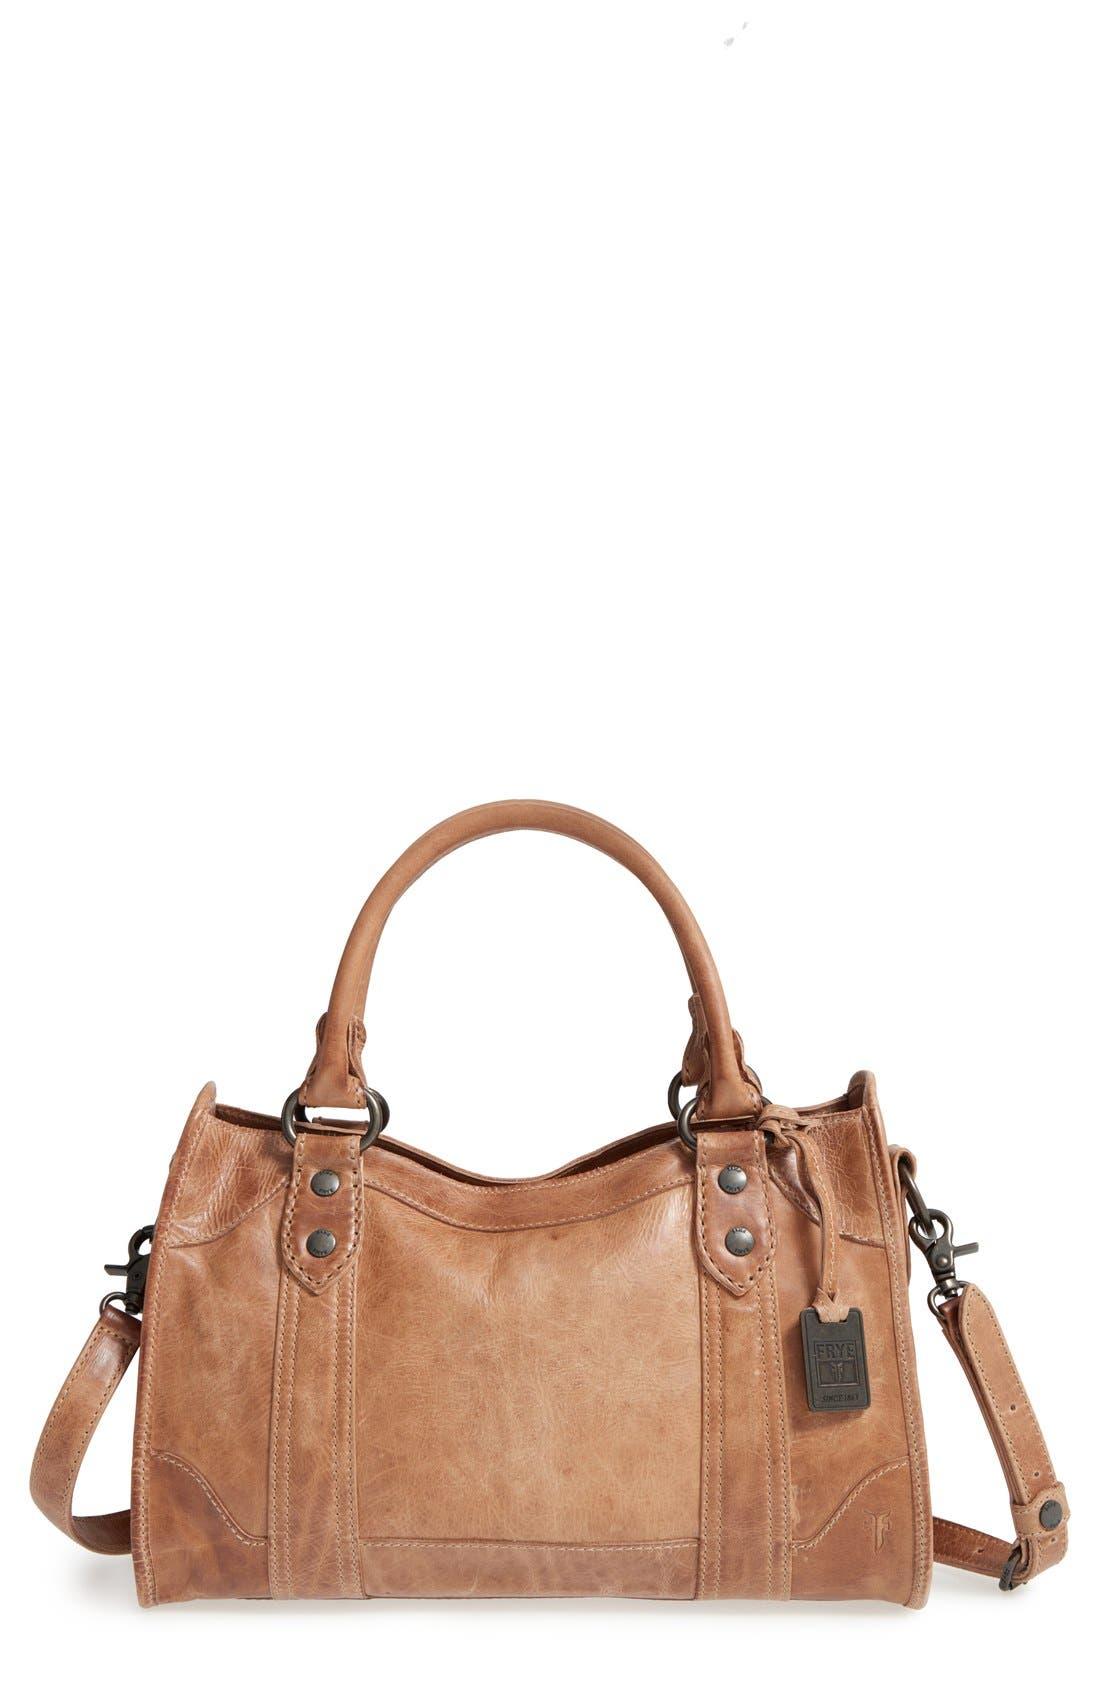 Alternate Image 1 Selected - Frye 'Melissa' Washed Leather Satchel